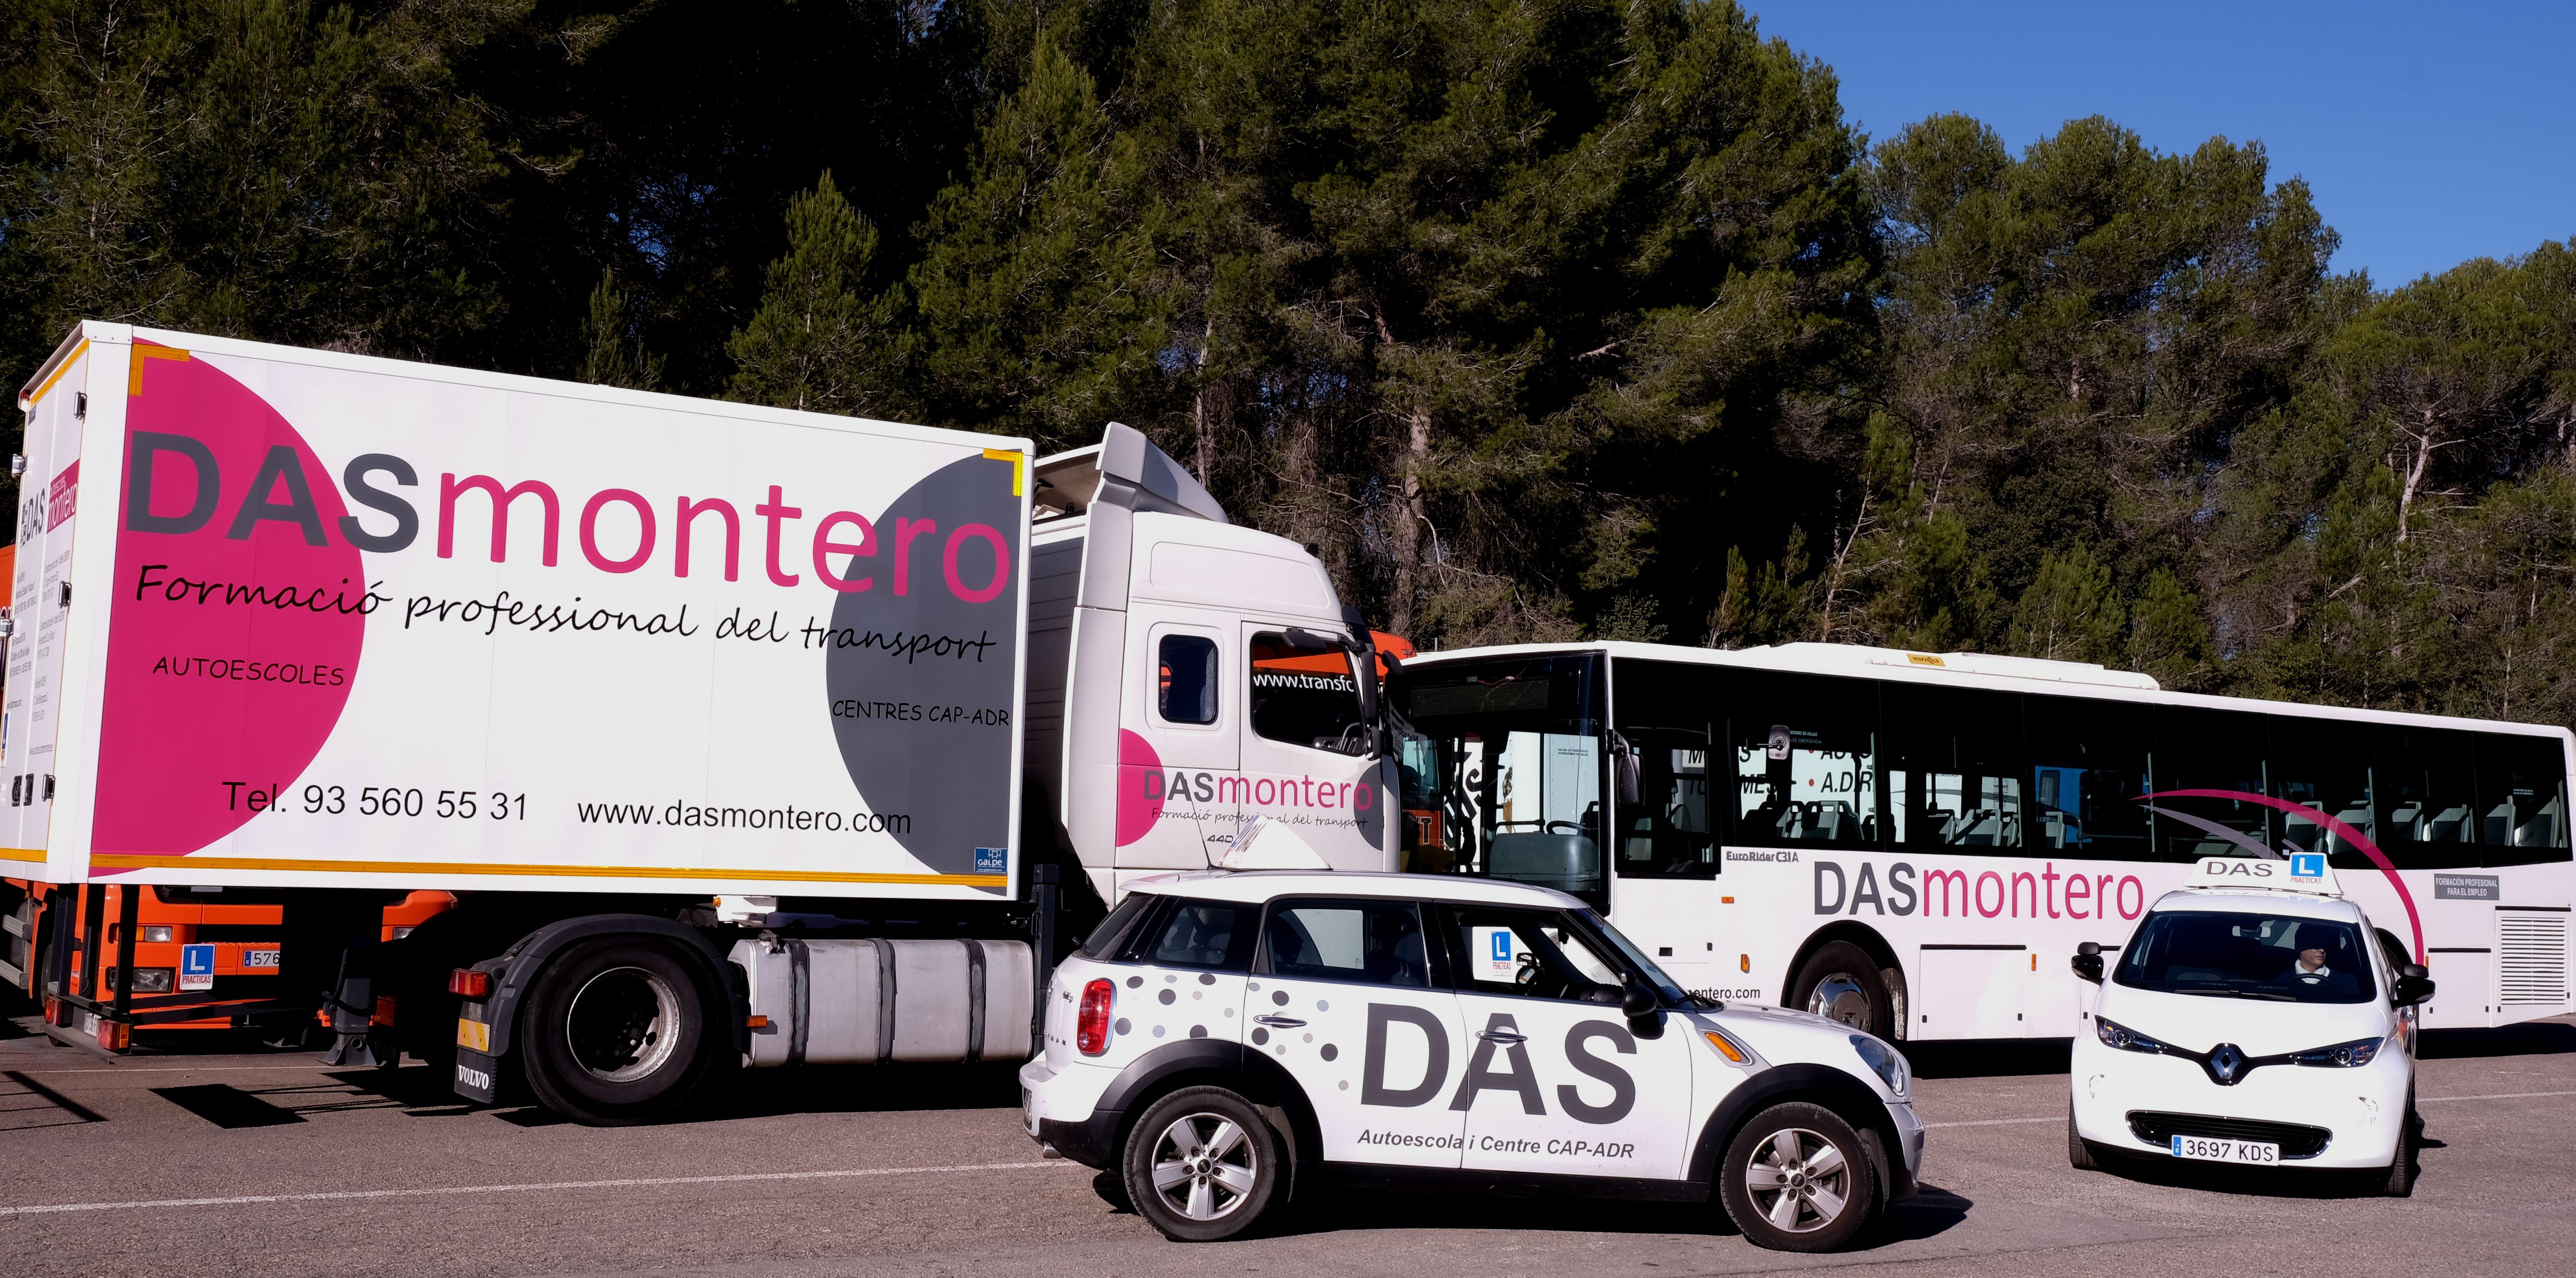 DAS FORMACIO PROFESSIONAL DEL TRANSPORT